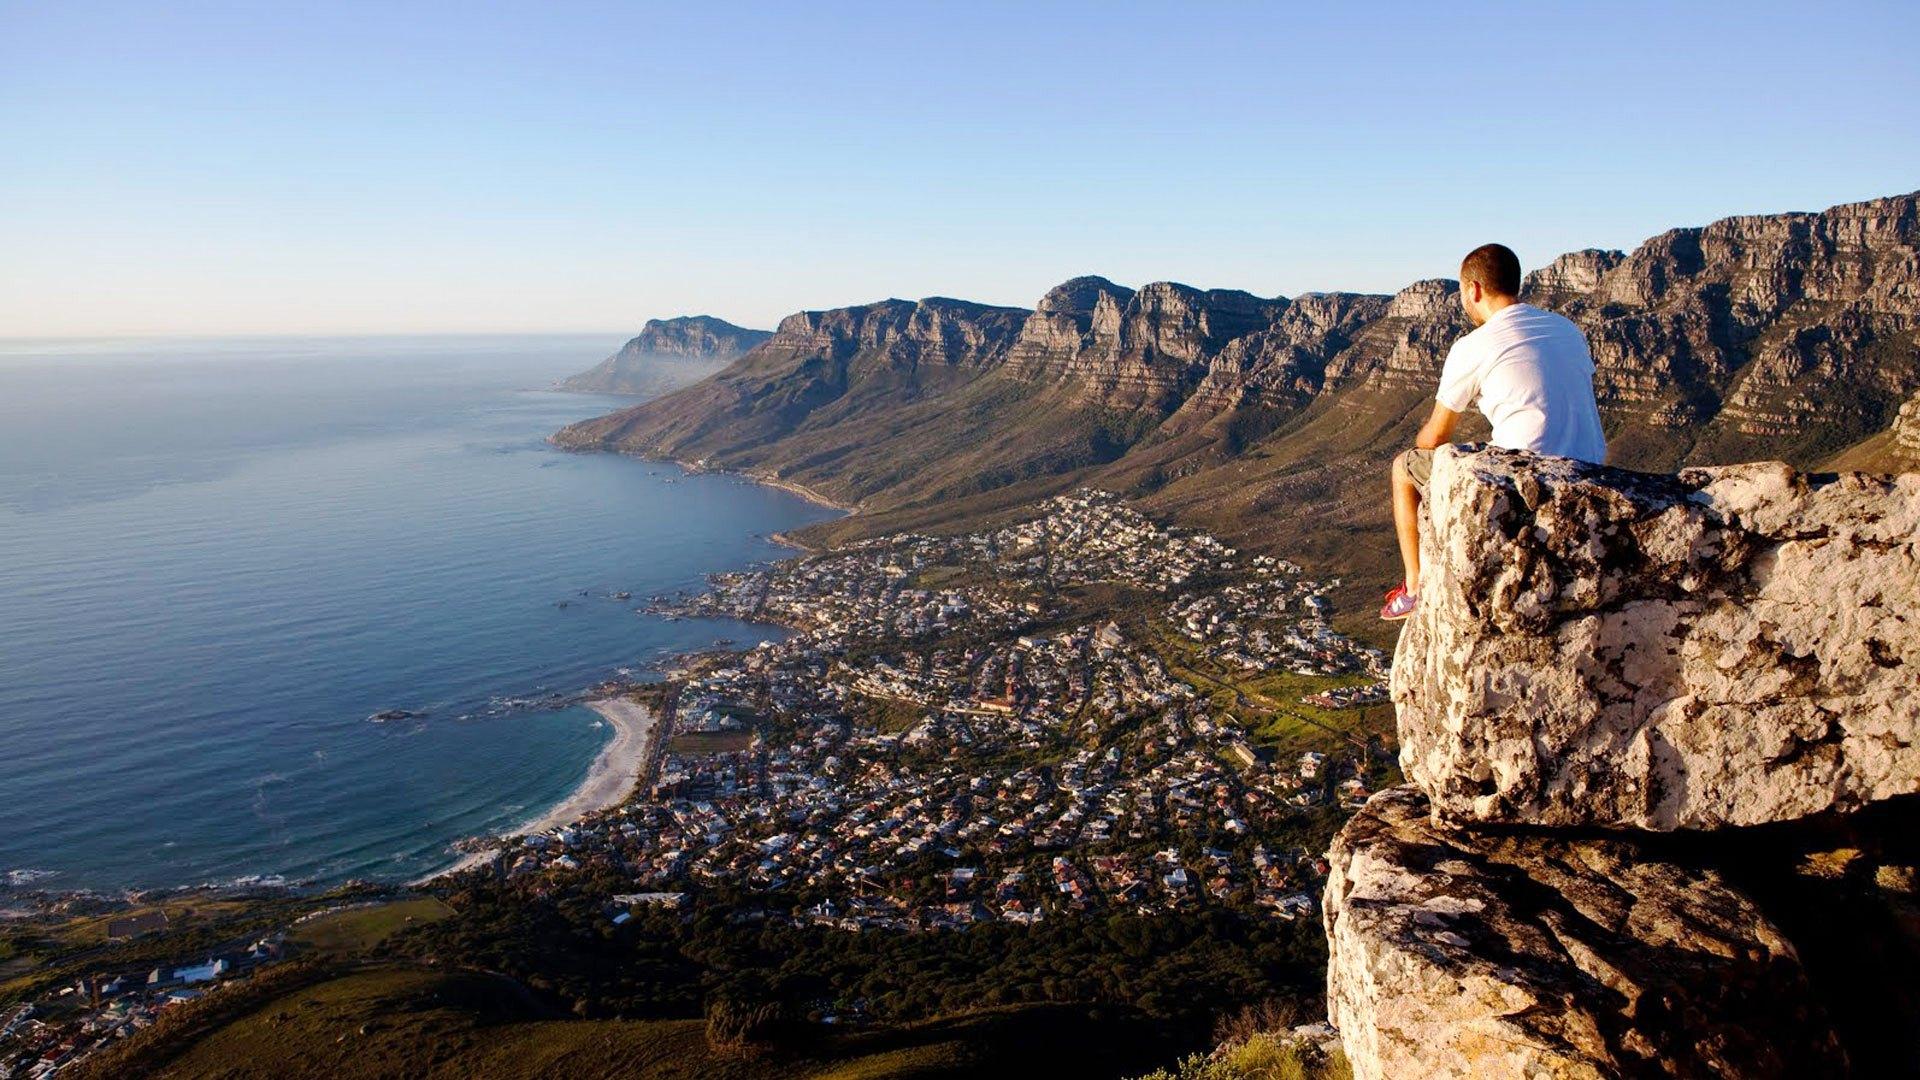 Looking towards the Twelve Apostles from Lion's Head peak. Image found   here